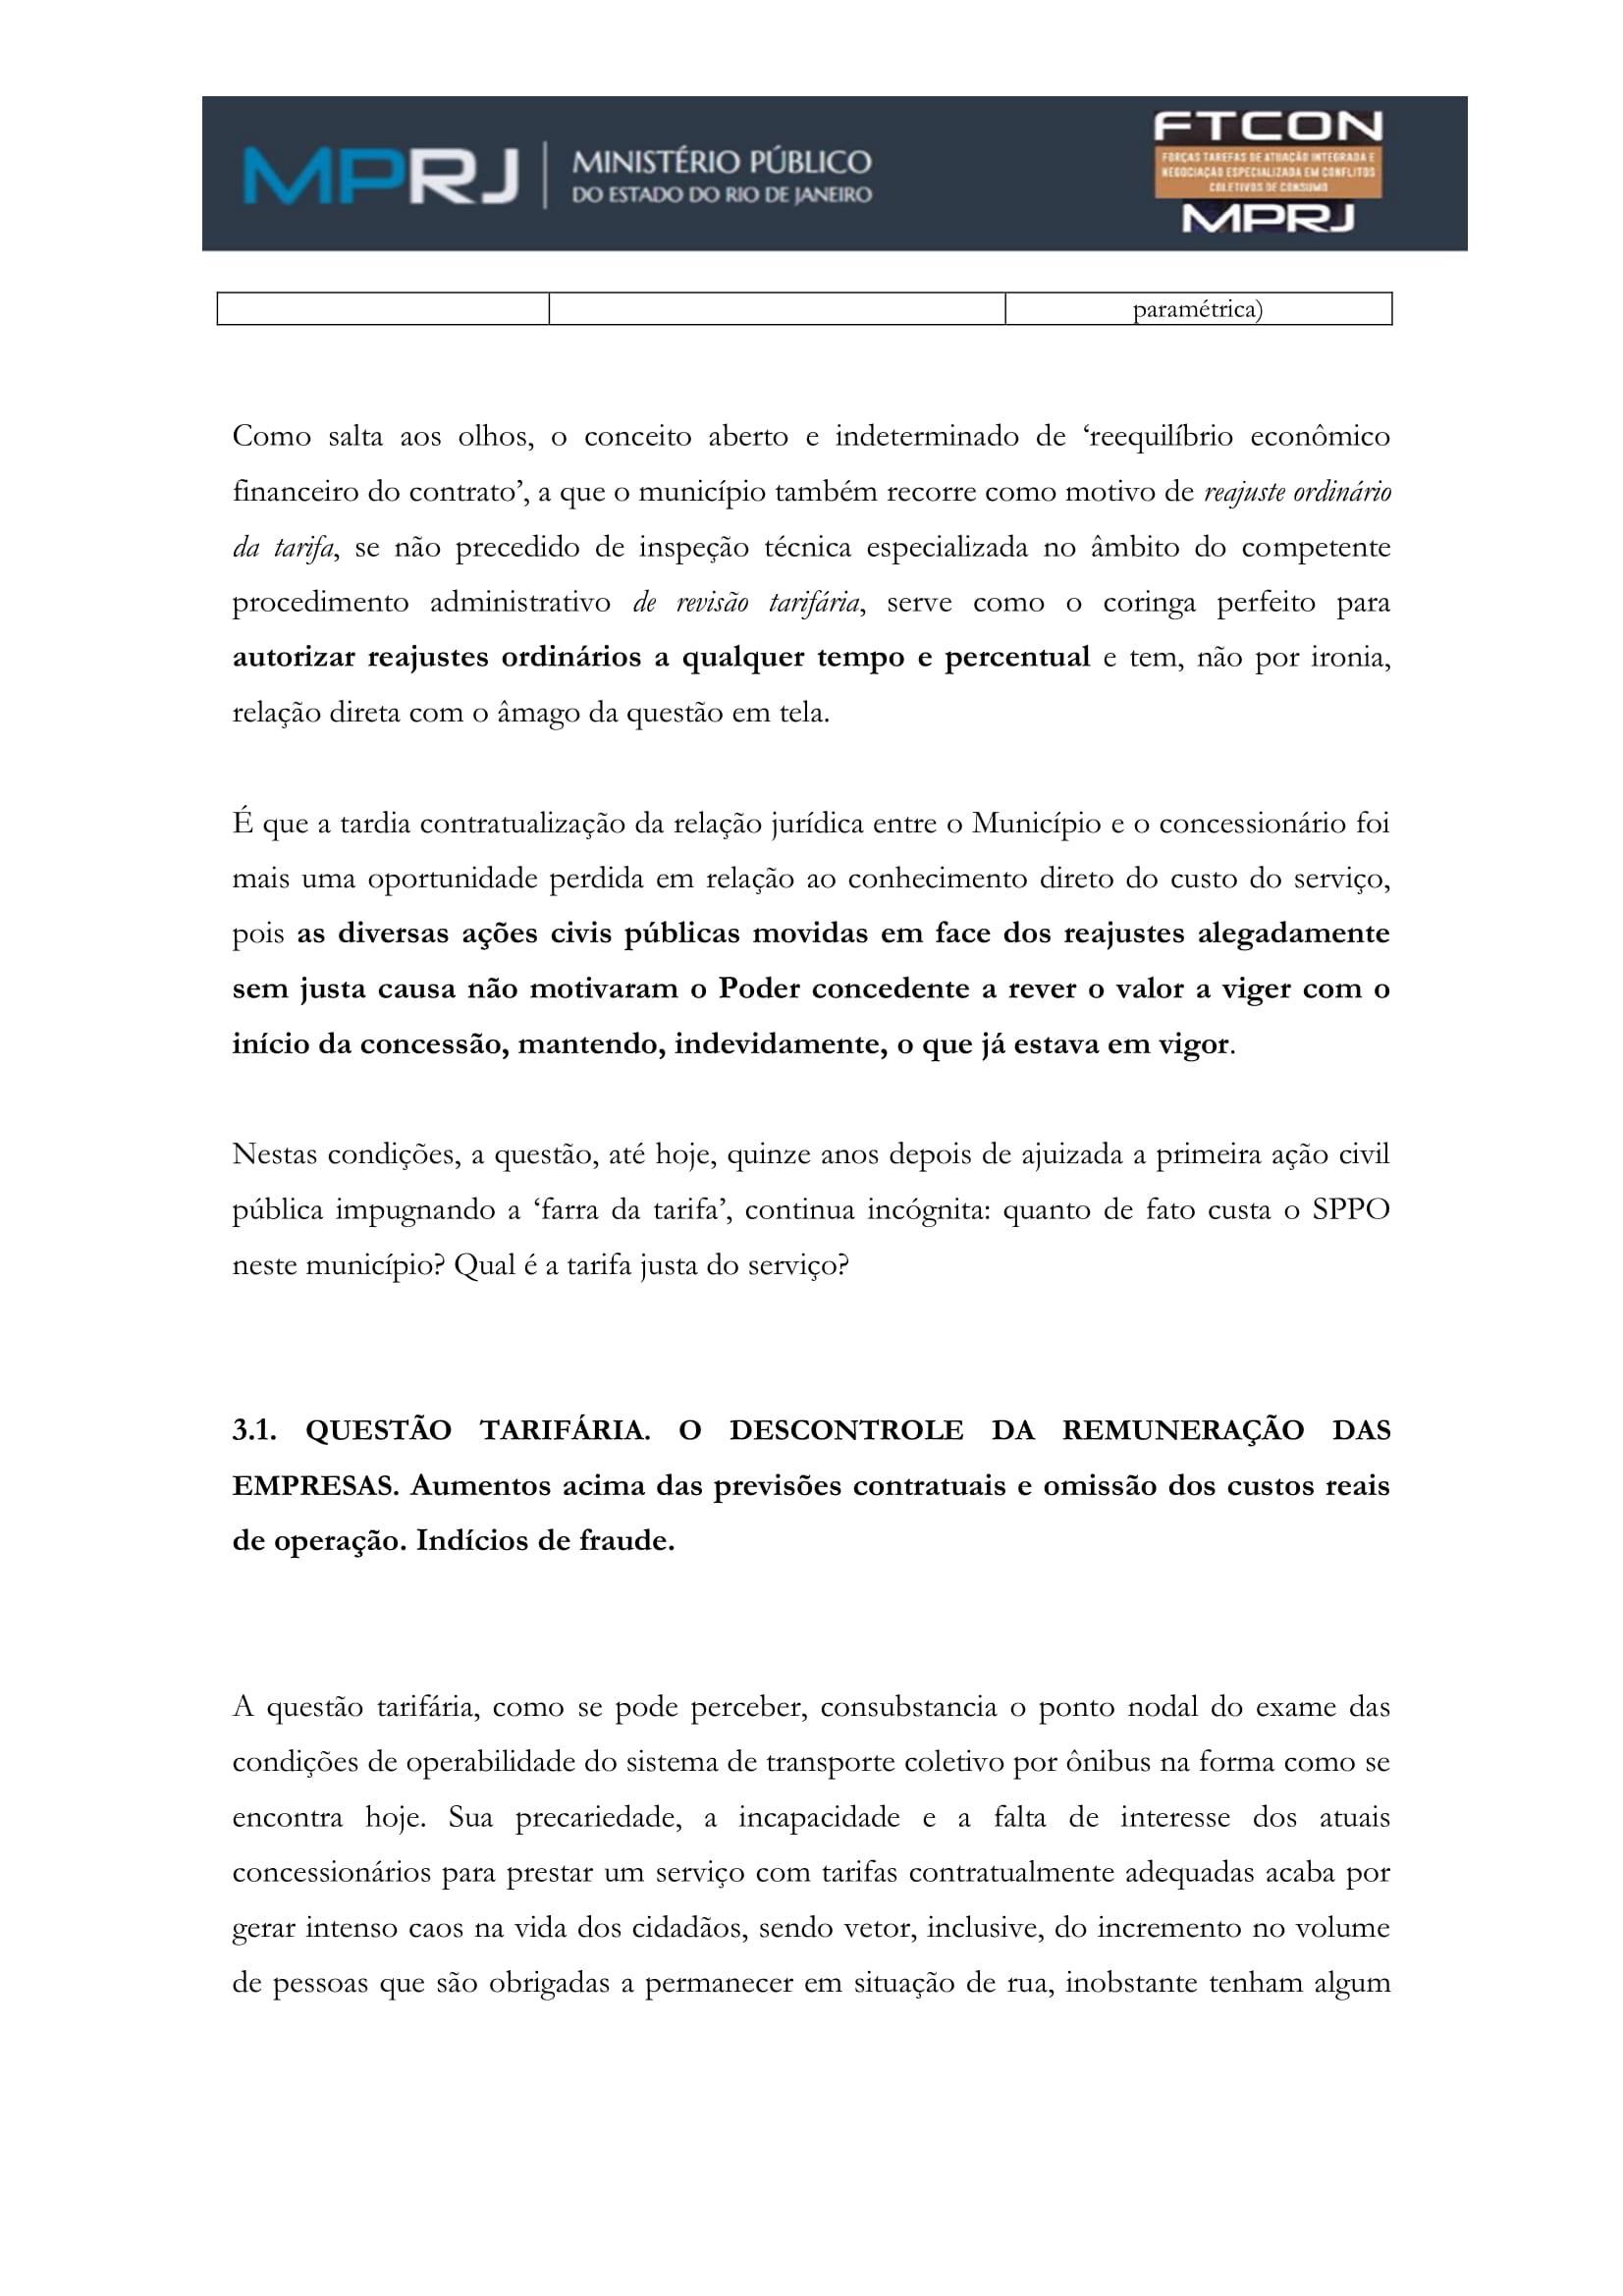 acp_caducidade_onibus_dr_rt-064